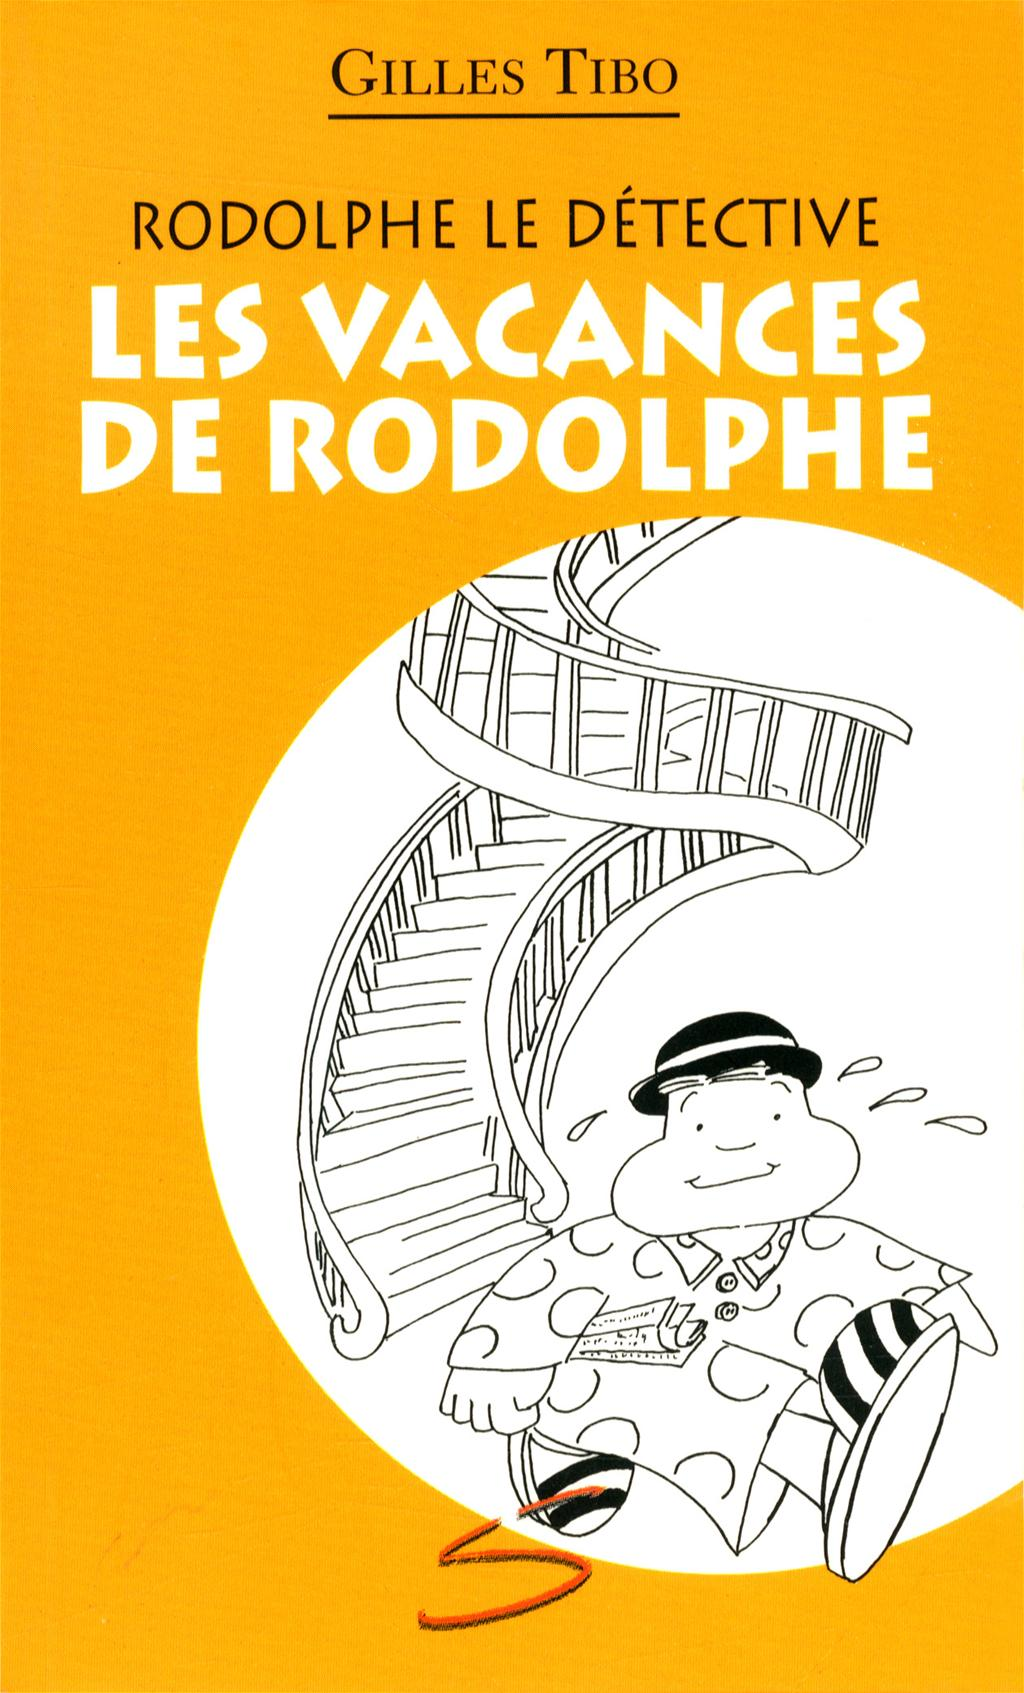 Les vacances de Rodolphe : un roman